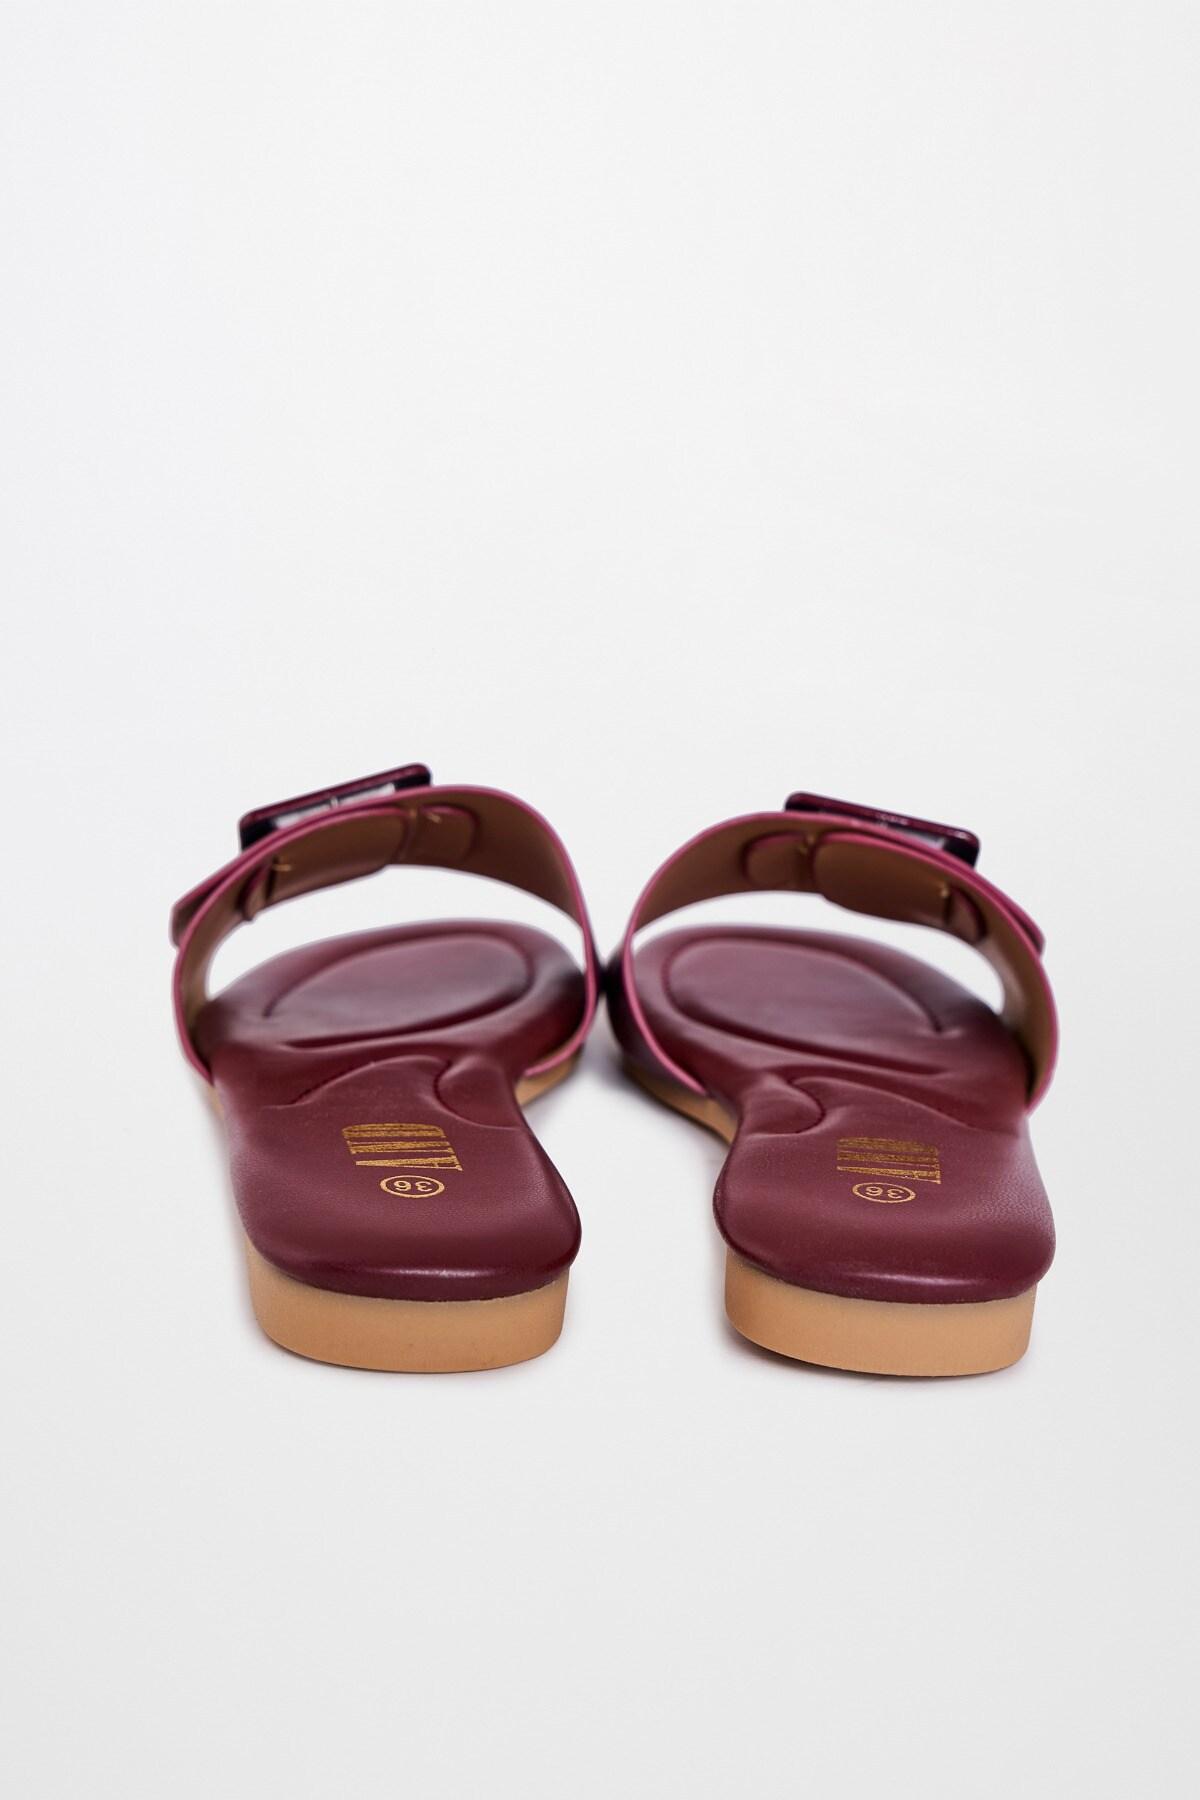 AND | Burgundy Flat Slip-ons